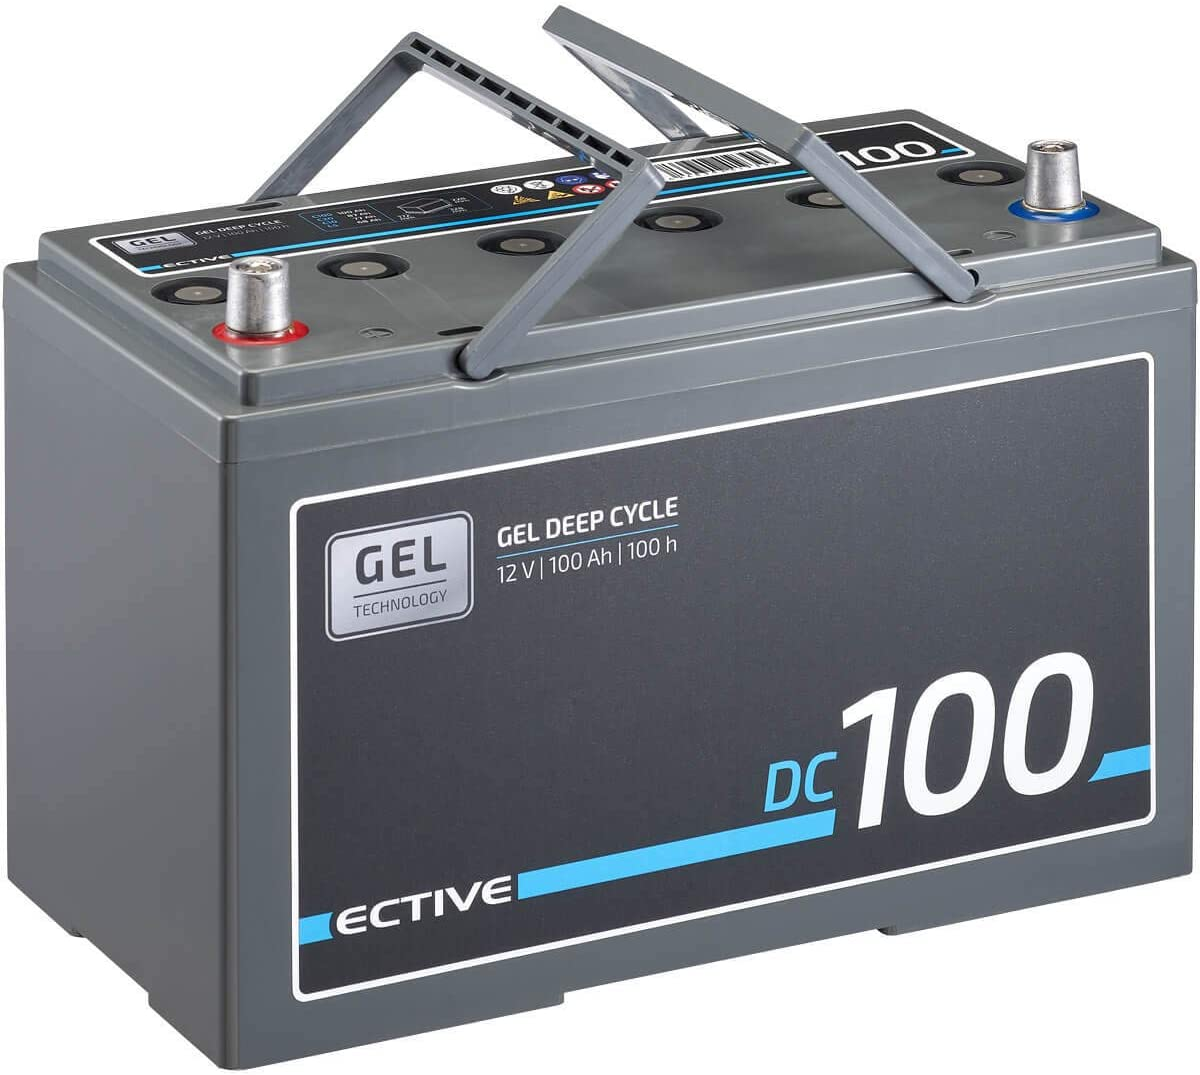 Ective 100ah 12v Gel Versorgungsbatterie Dc 100 Deep Cycle Solar Batterie Vrla Zyklenfest Wartungsfrei Auto